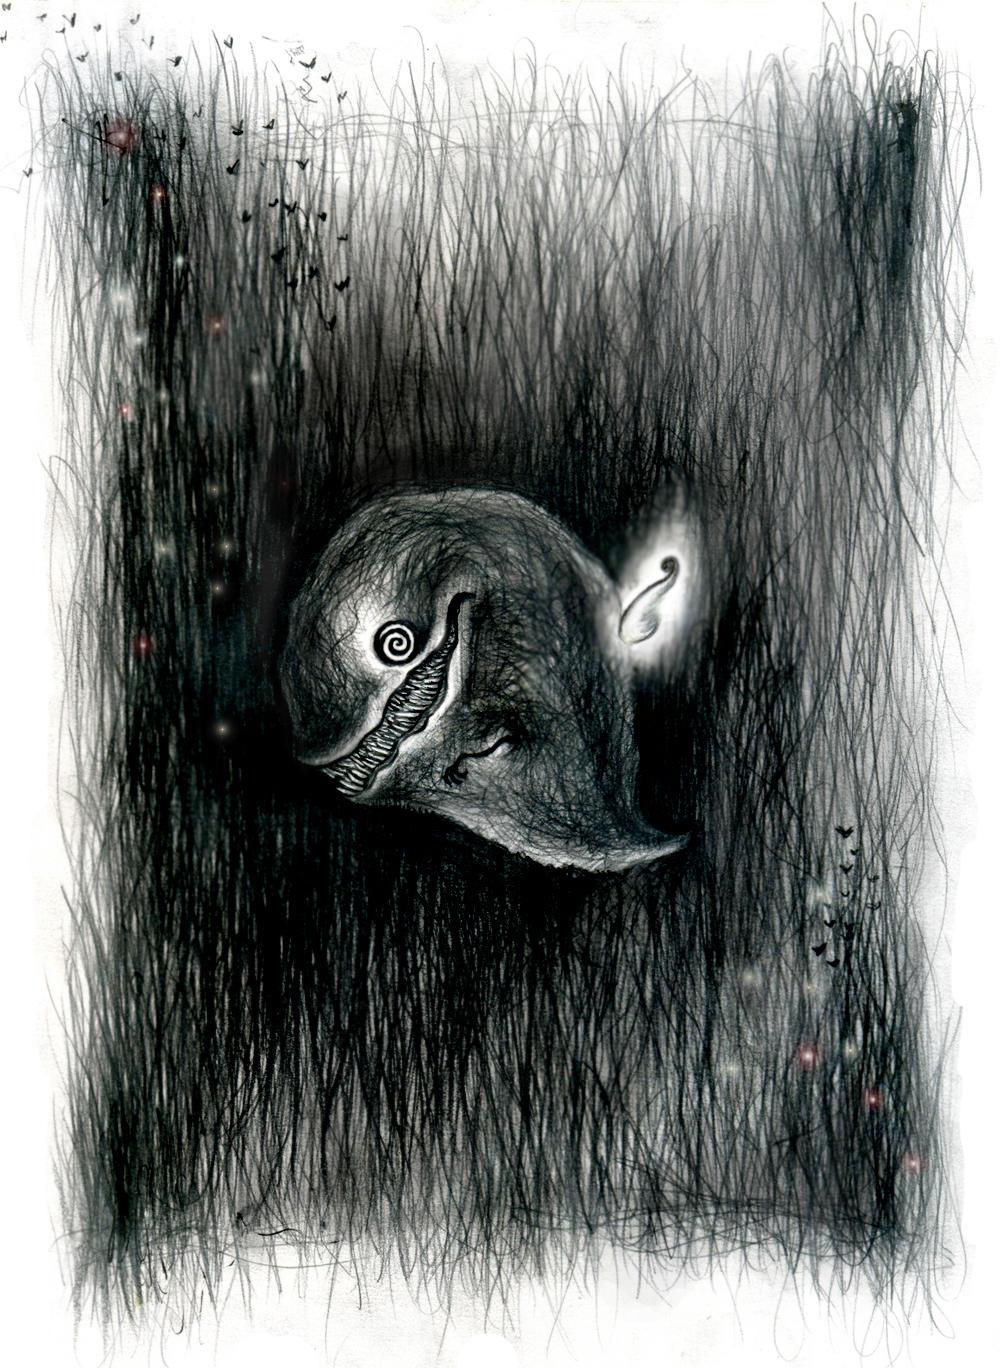 BlaBlaBla by Anuk